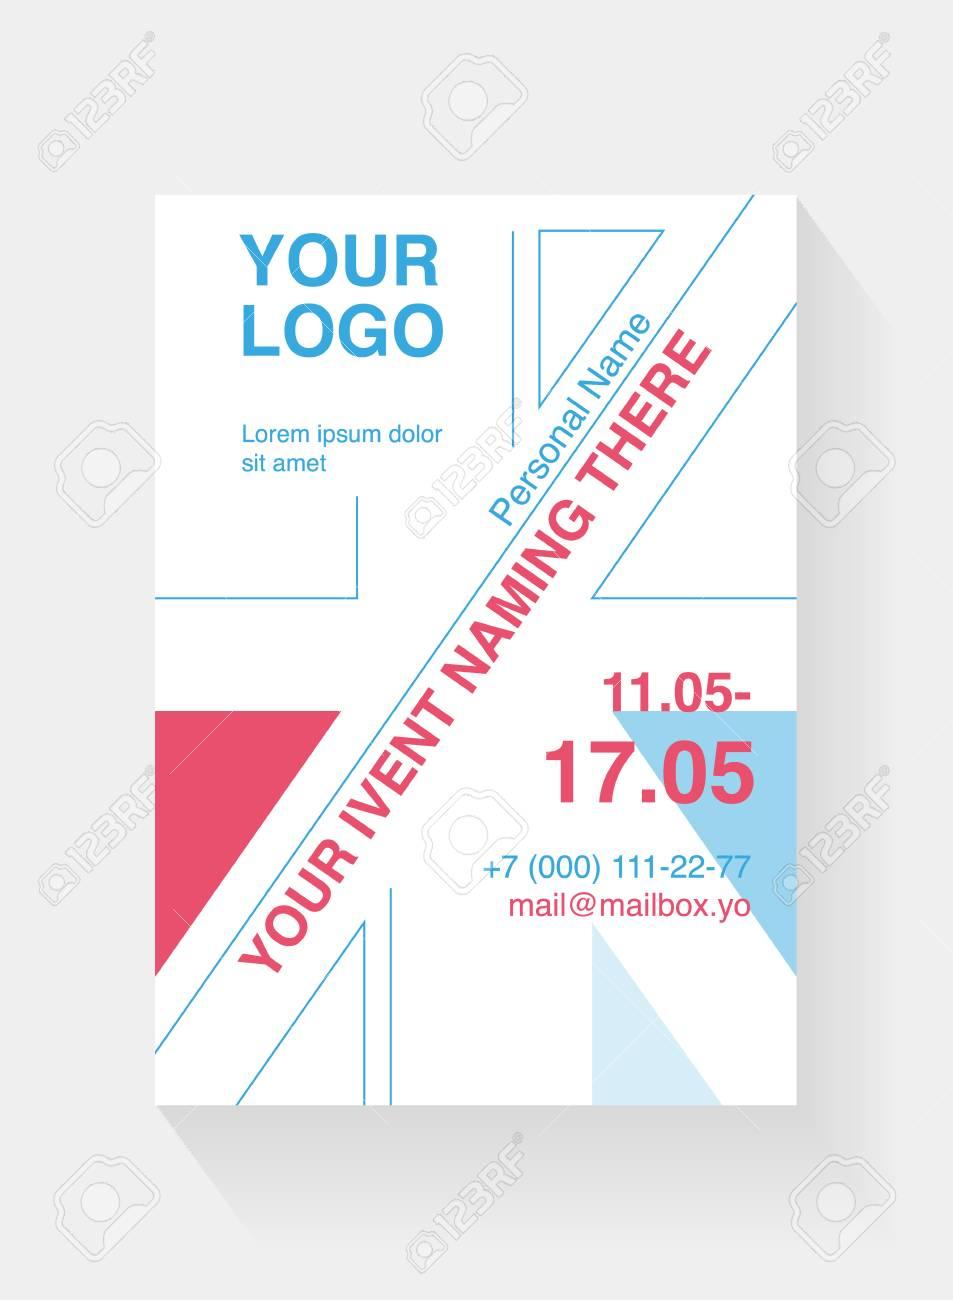 A5 Flyer Template Based On British Flag Design Leaflet Cover Invite